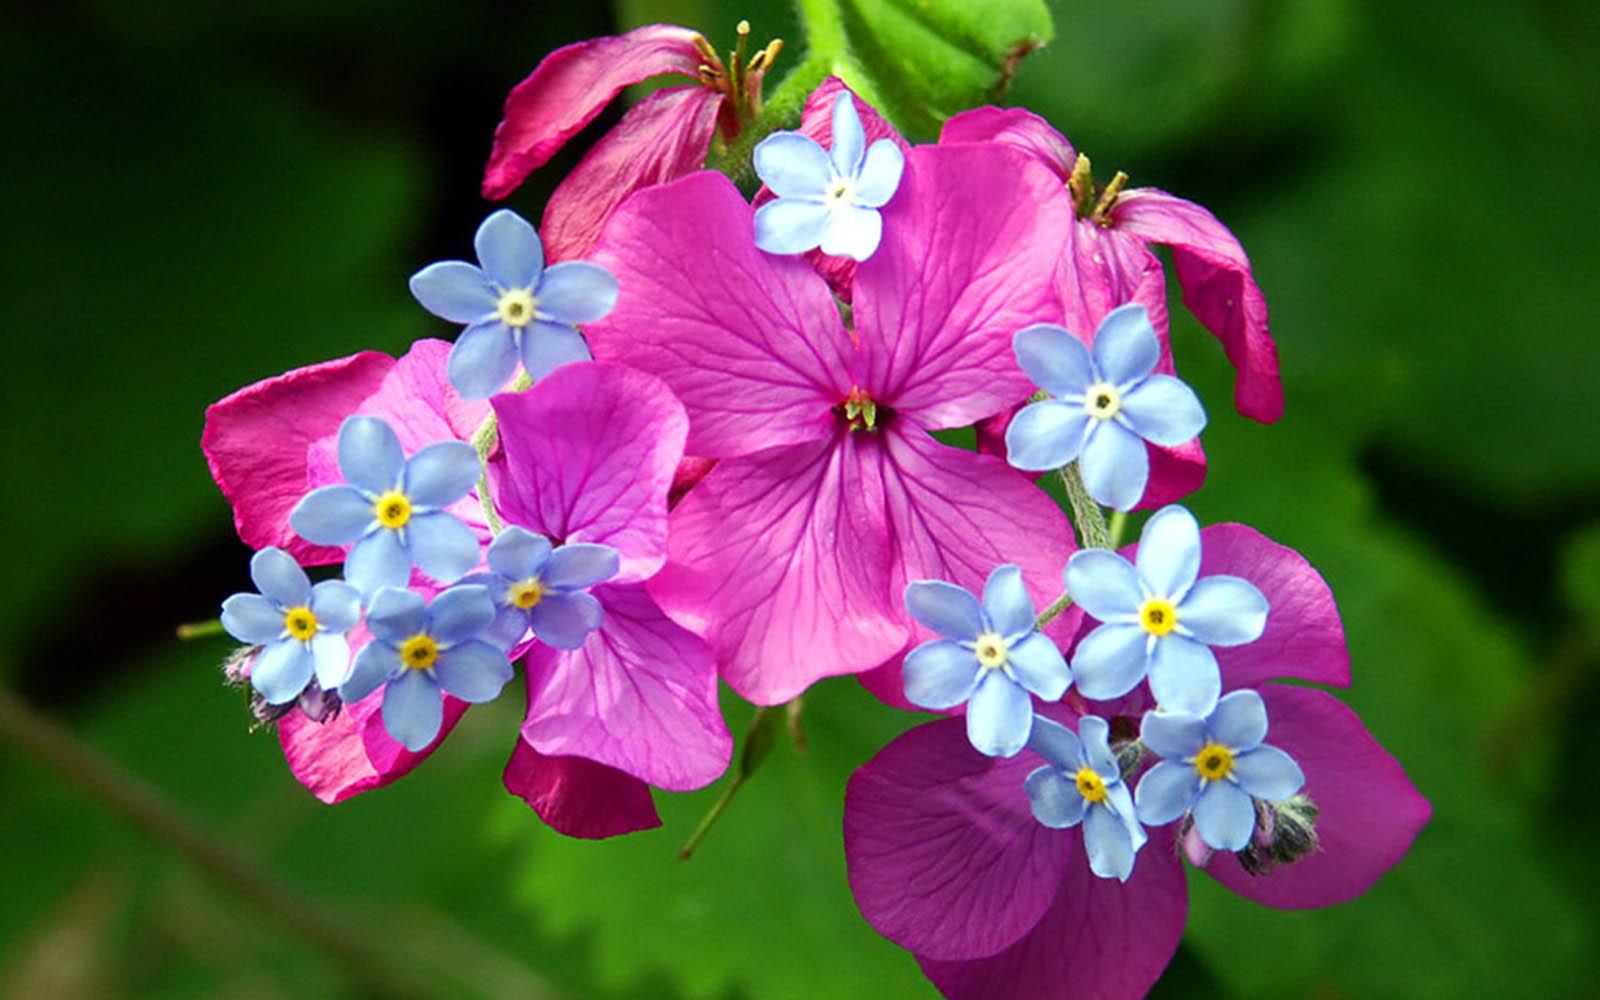 Spring Flowers Wallpapers 1080p Yodobi